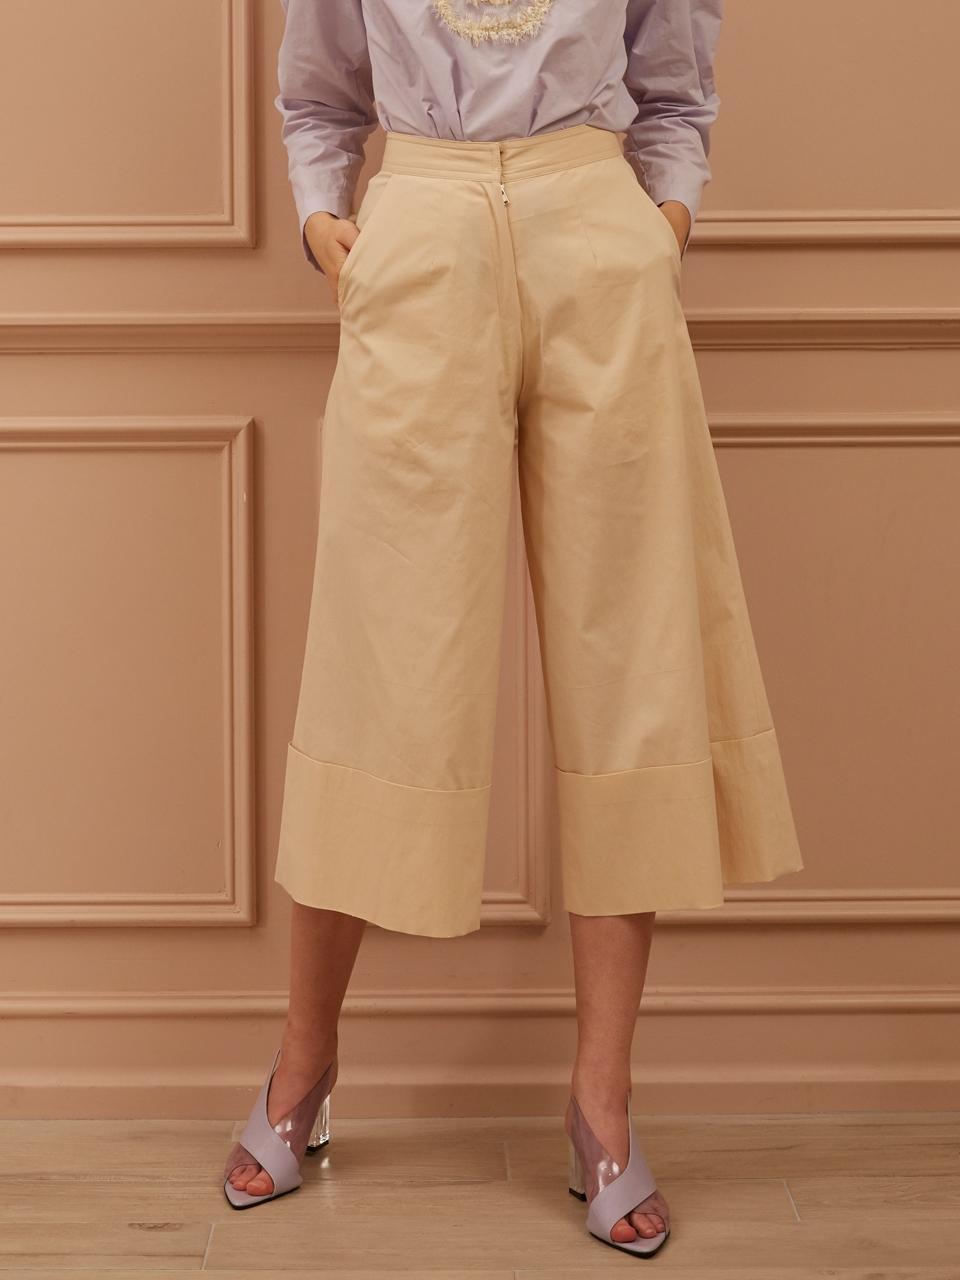 CAHIERS国际品牌品牌2020春夏经典修身中低腰缝褶细节真丝女士九分裤_淡紫色